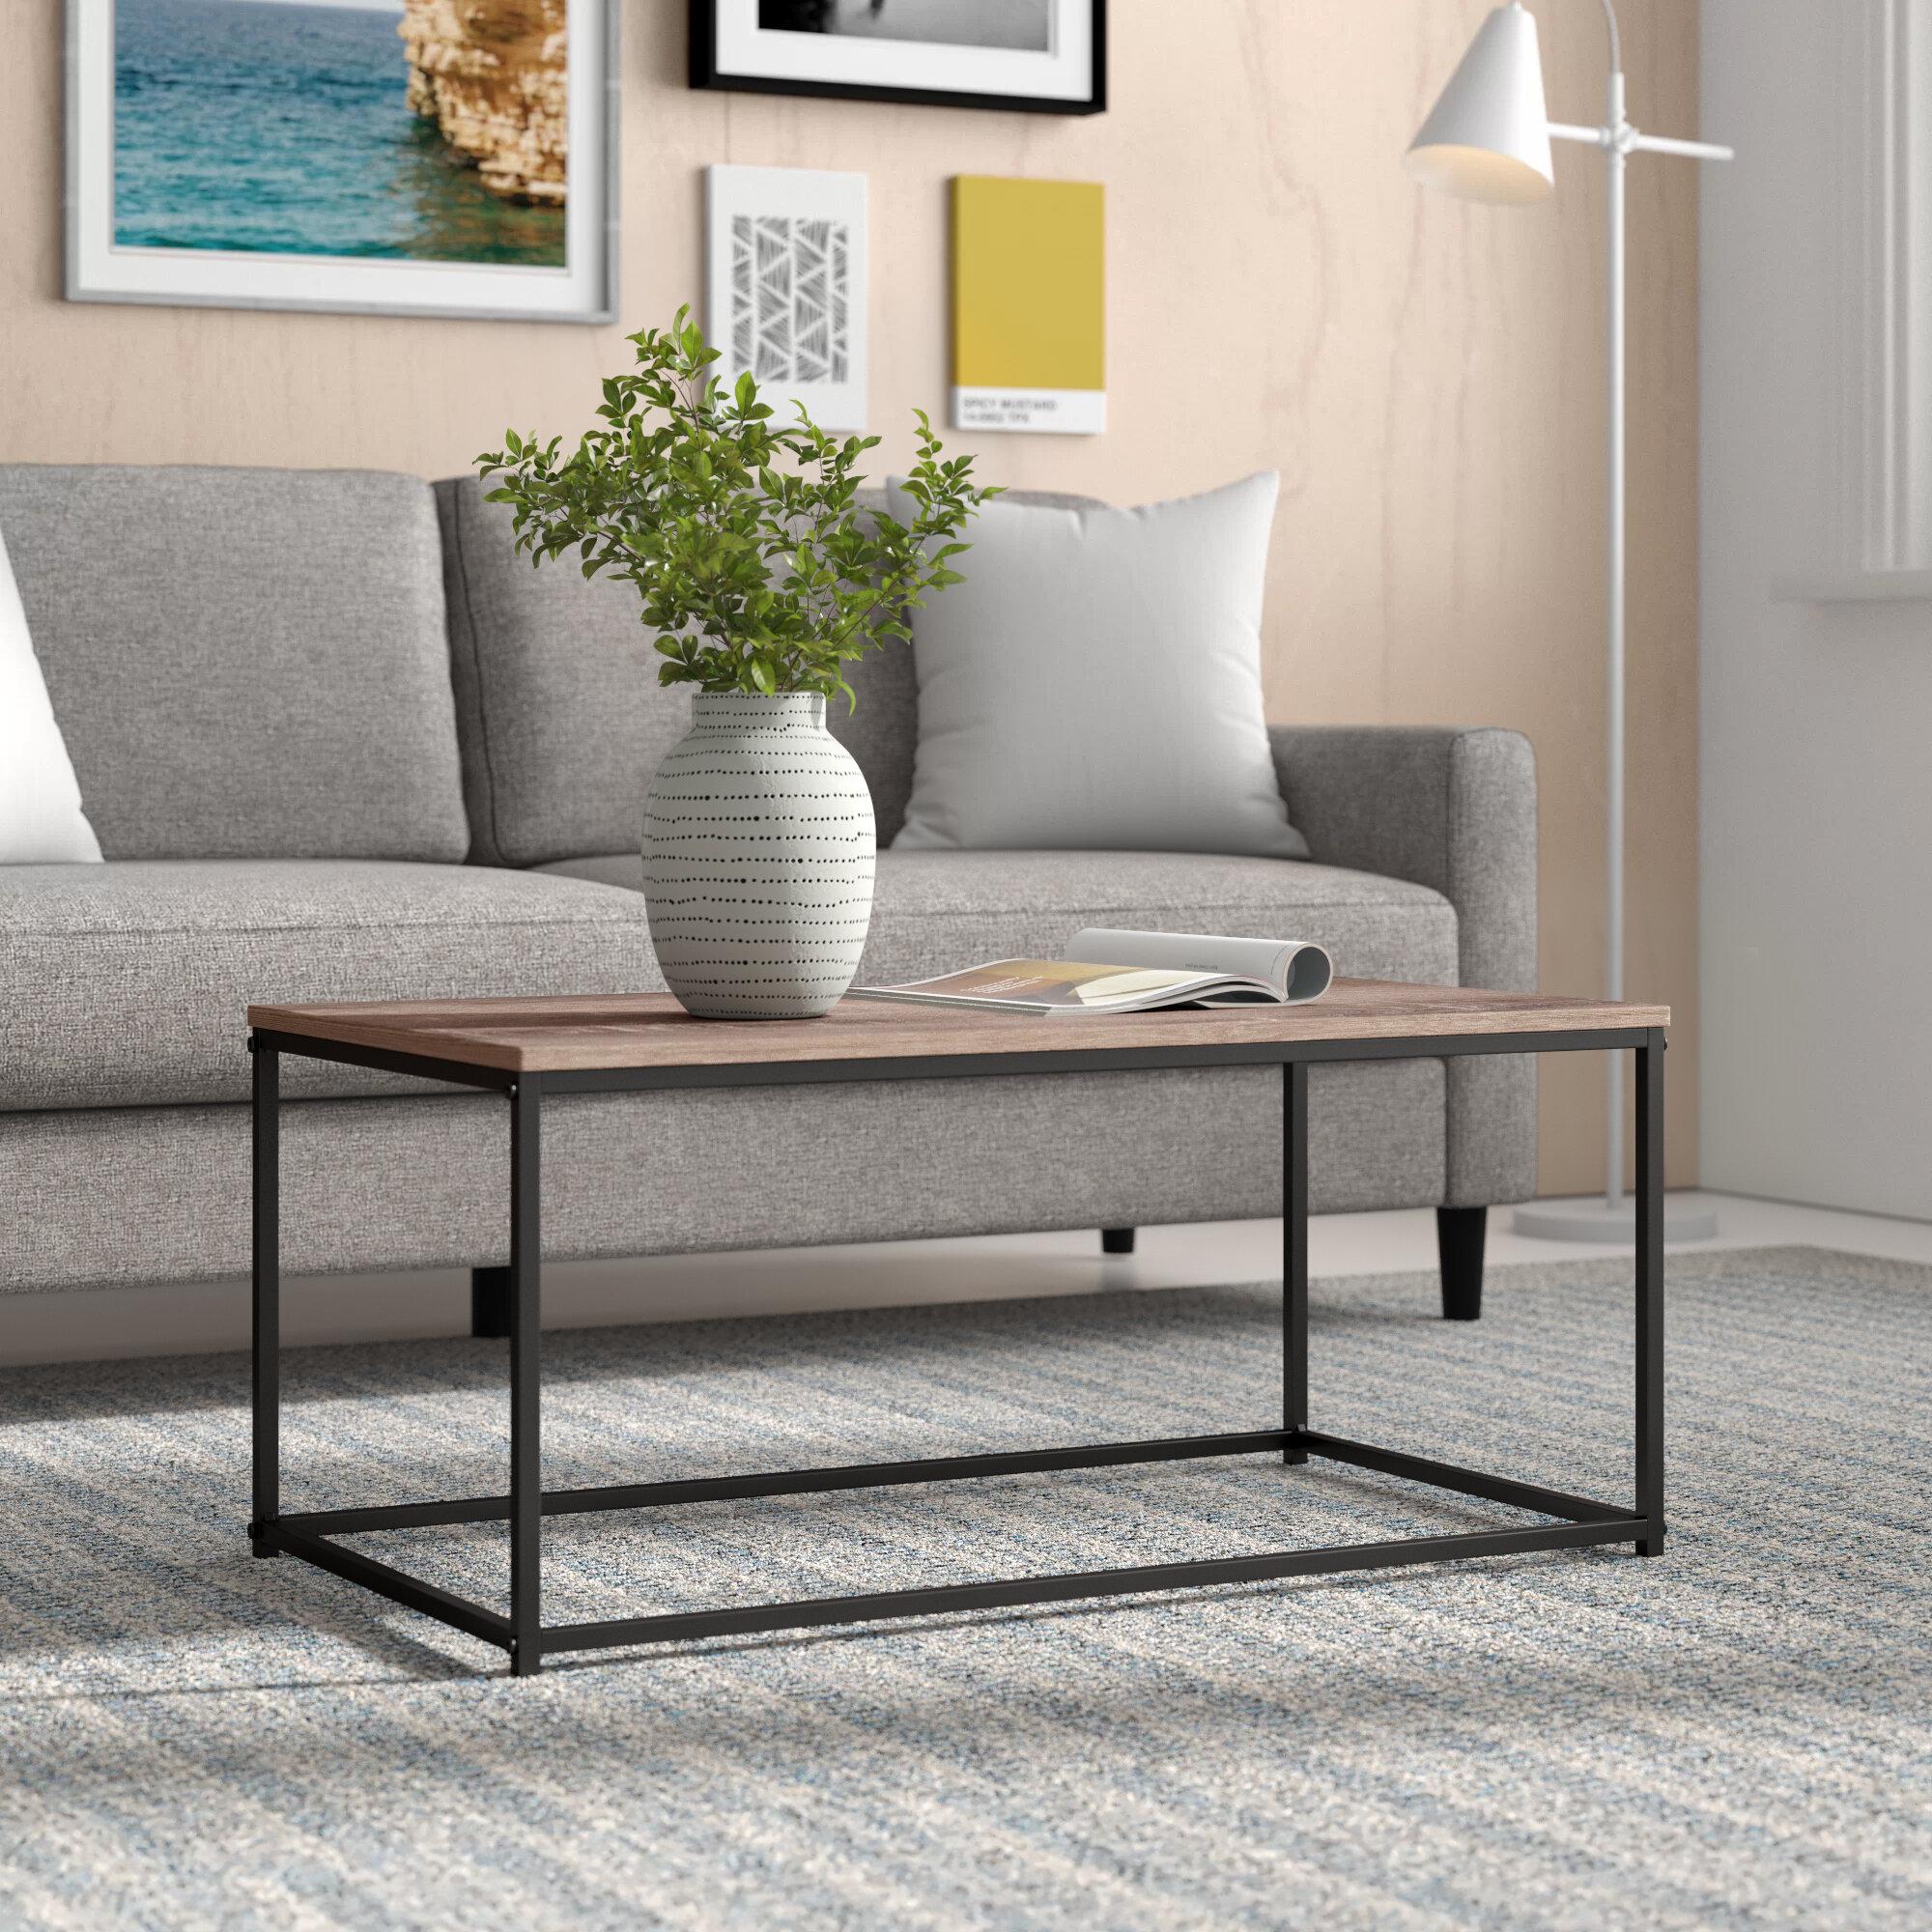 Zipcode Design Senoia Frame Coffee Table Reviews Wayfair